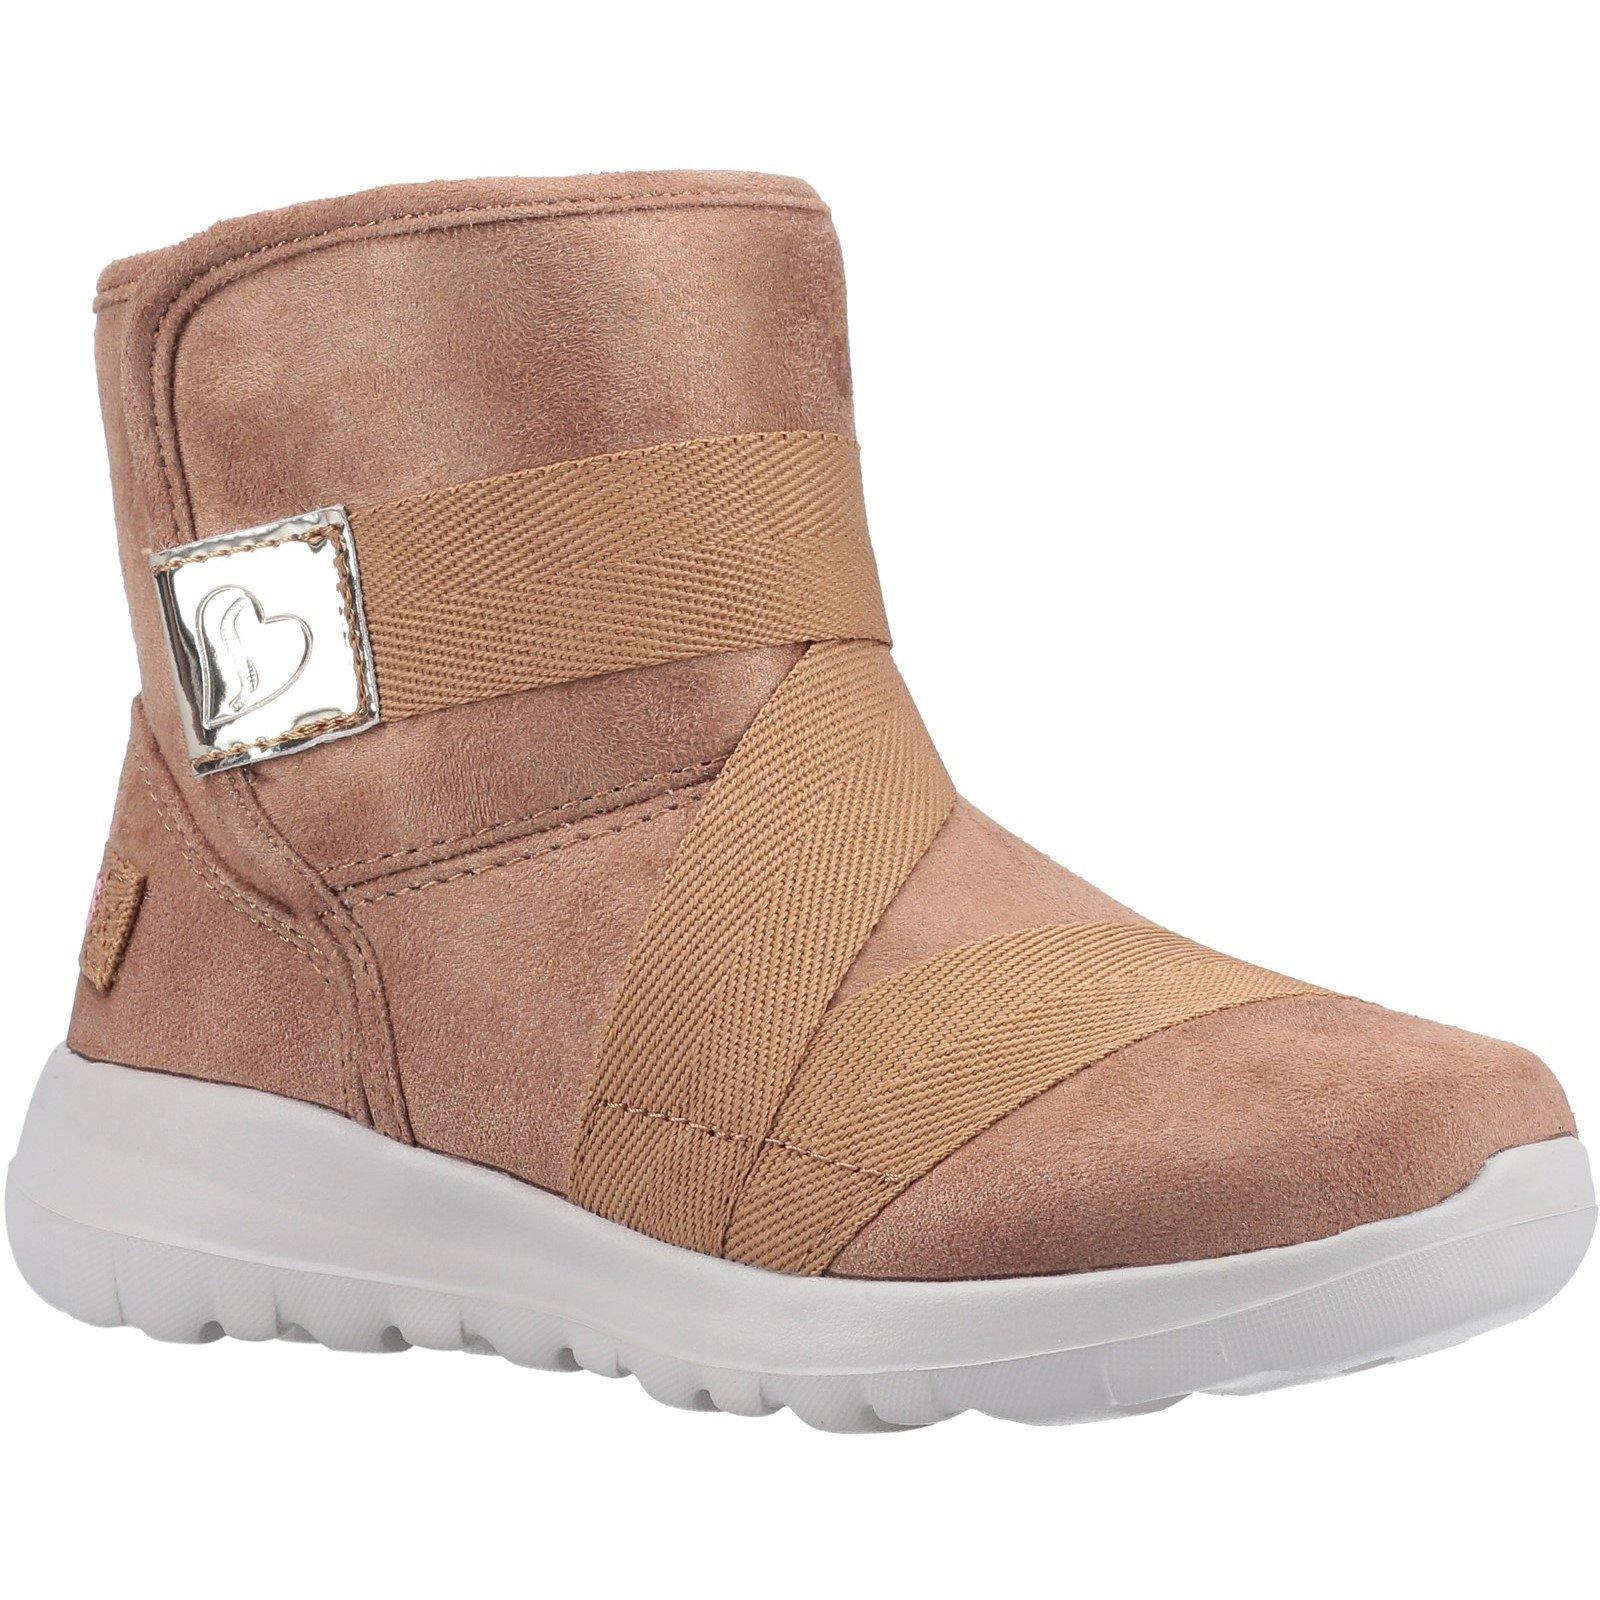 Skechers Unisex Go Walk Joy Strong Willed Ankle Boot Chestnut 31167 - Chestnut 12